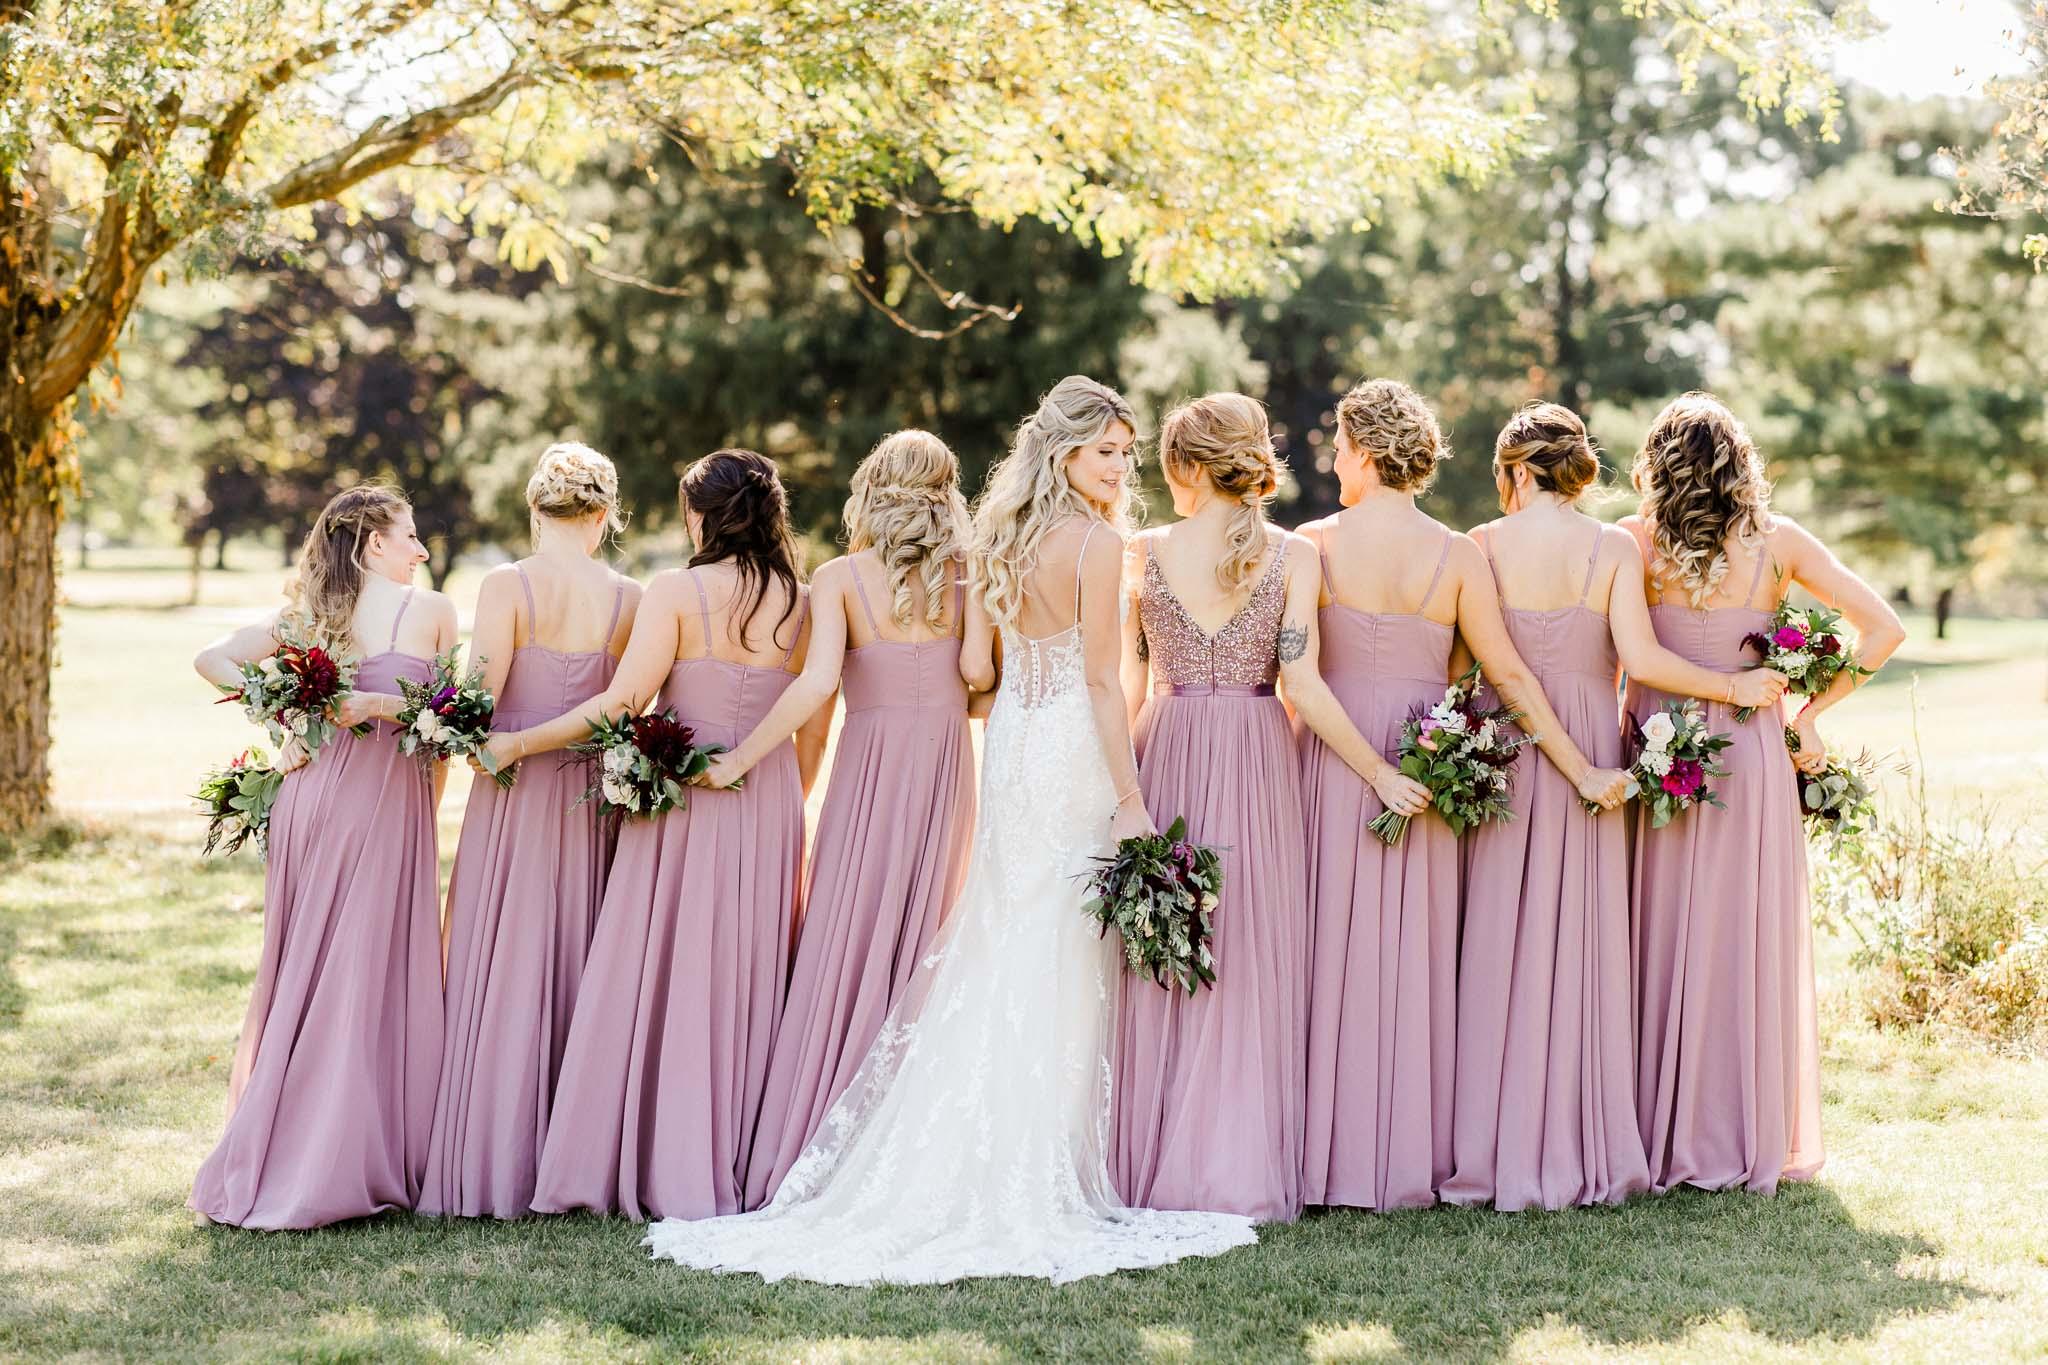 Frosty-Valley-September-Wedding-7392.jpg